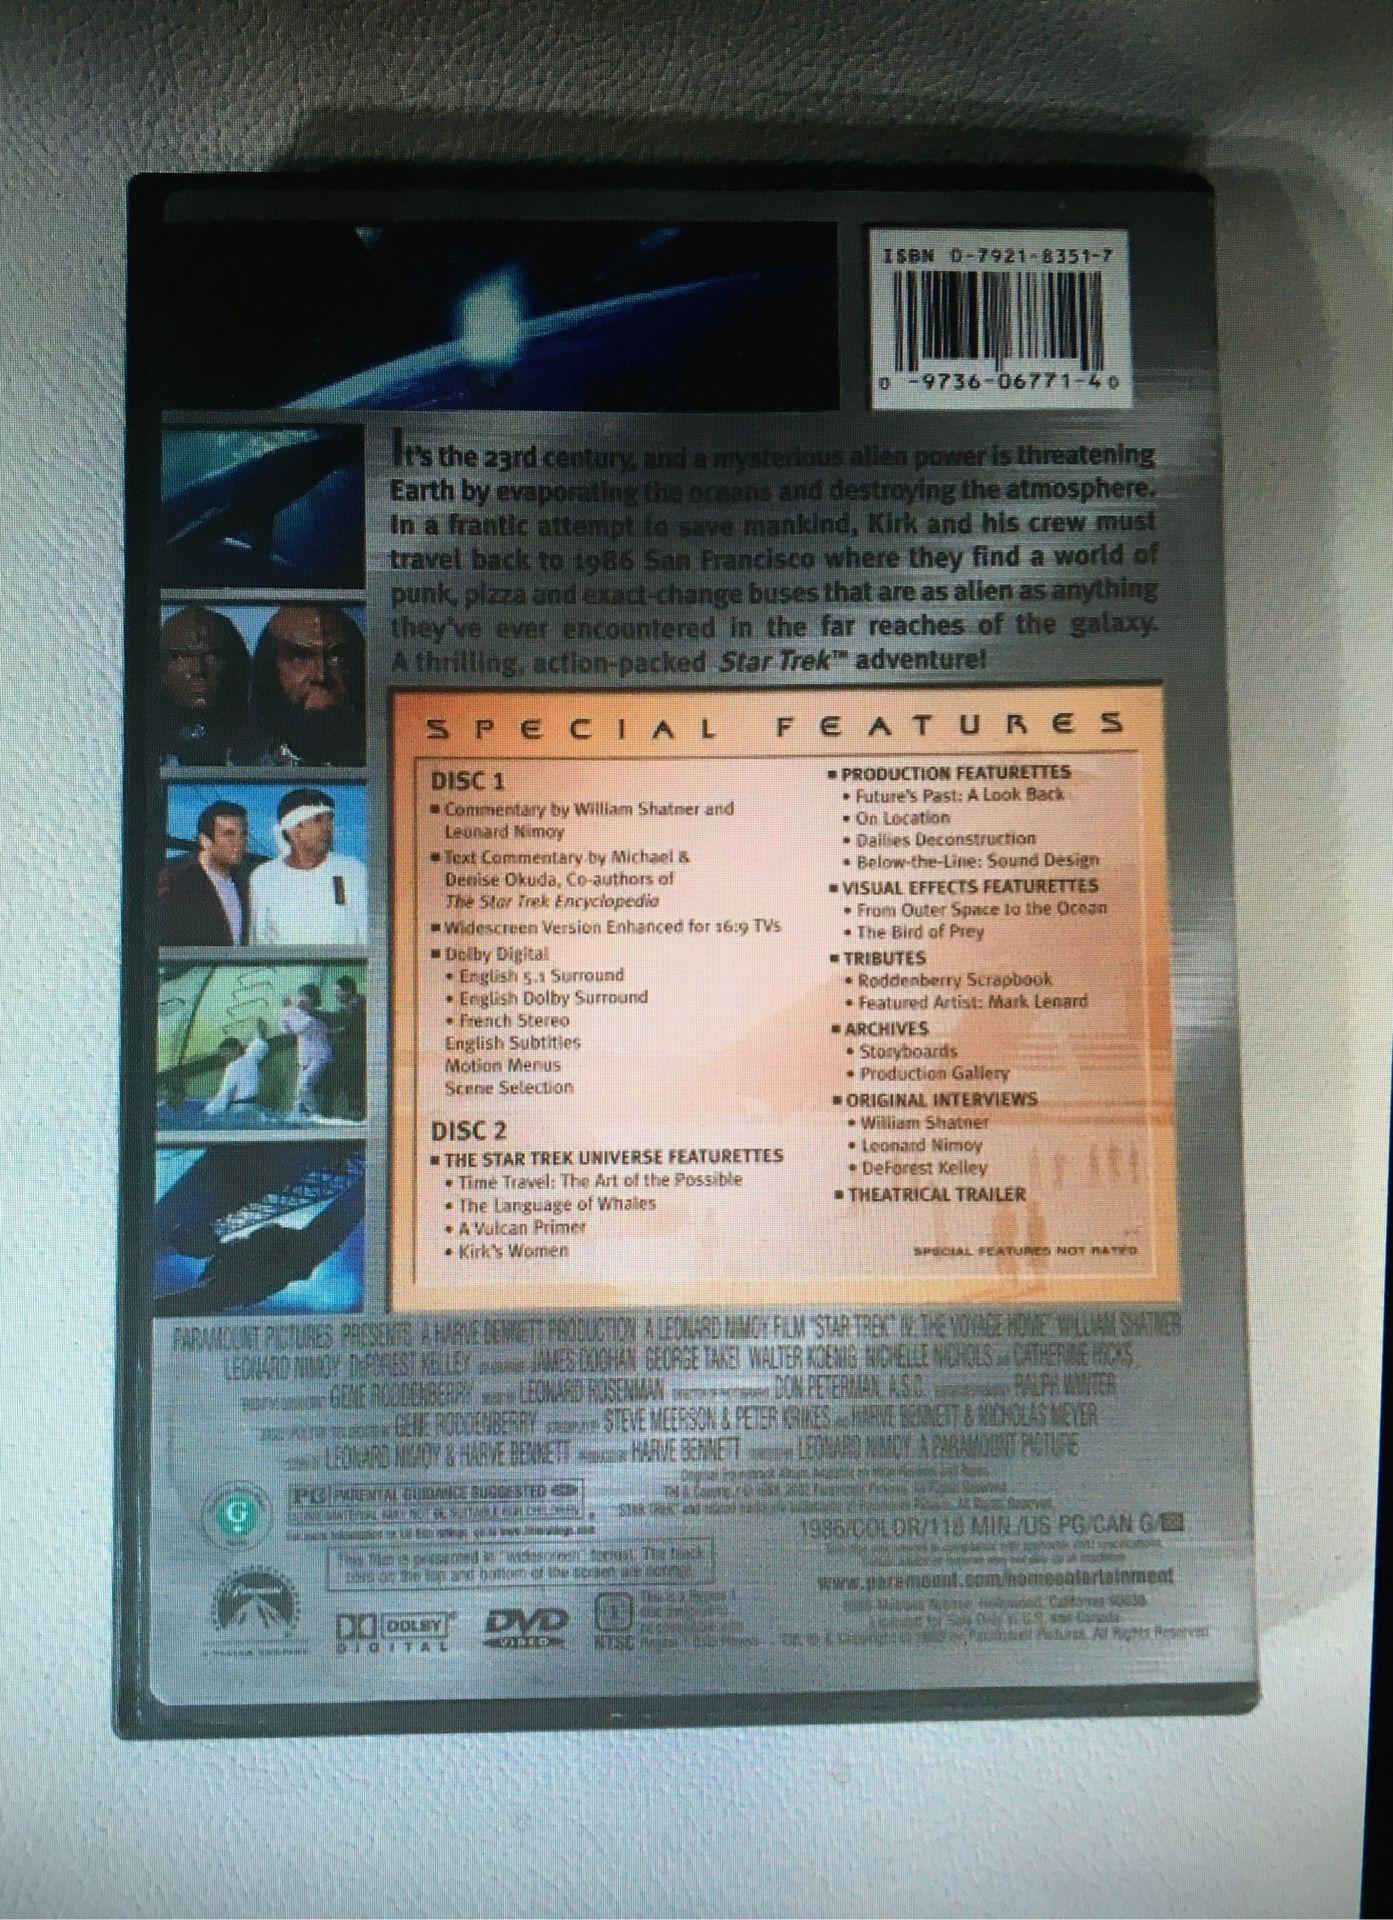 Lot of 5 Paramount DVD Movies (Shrek the Third, Star Trek, Transformers 2)